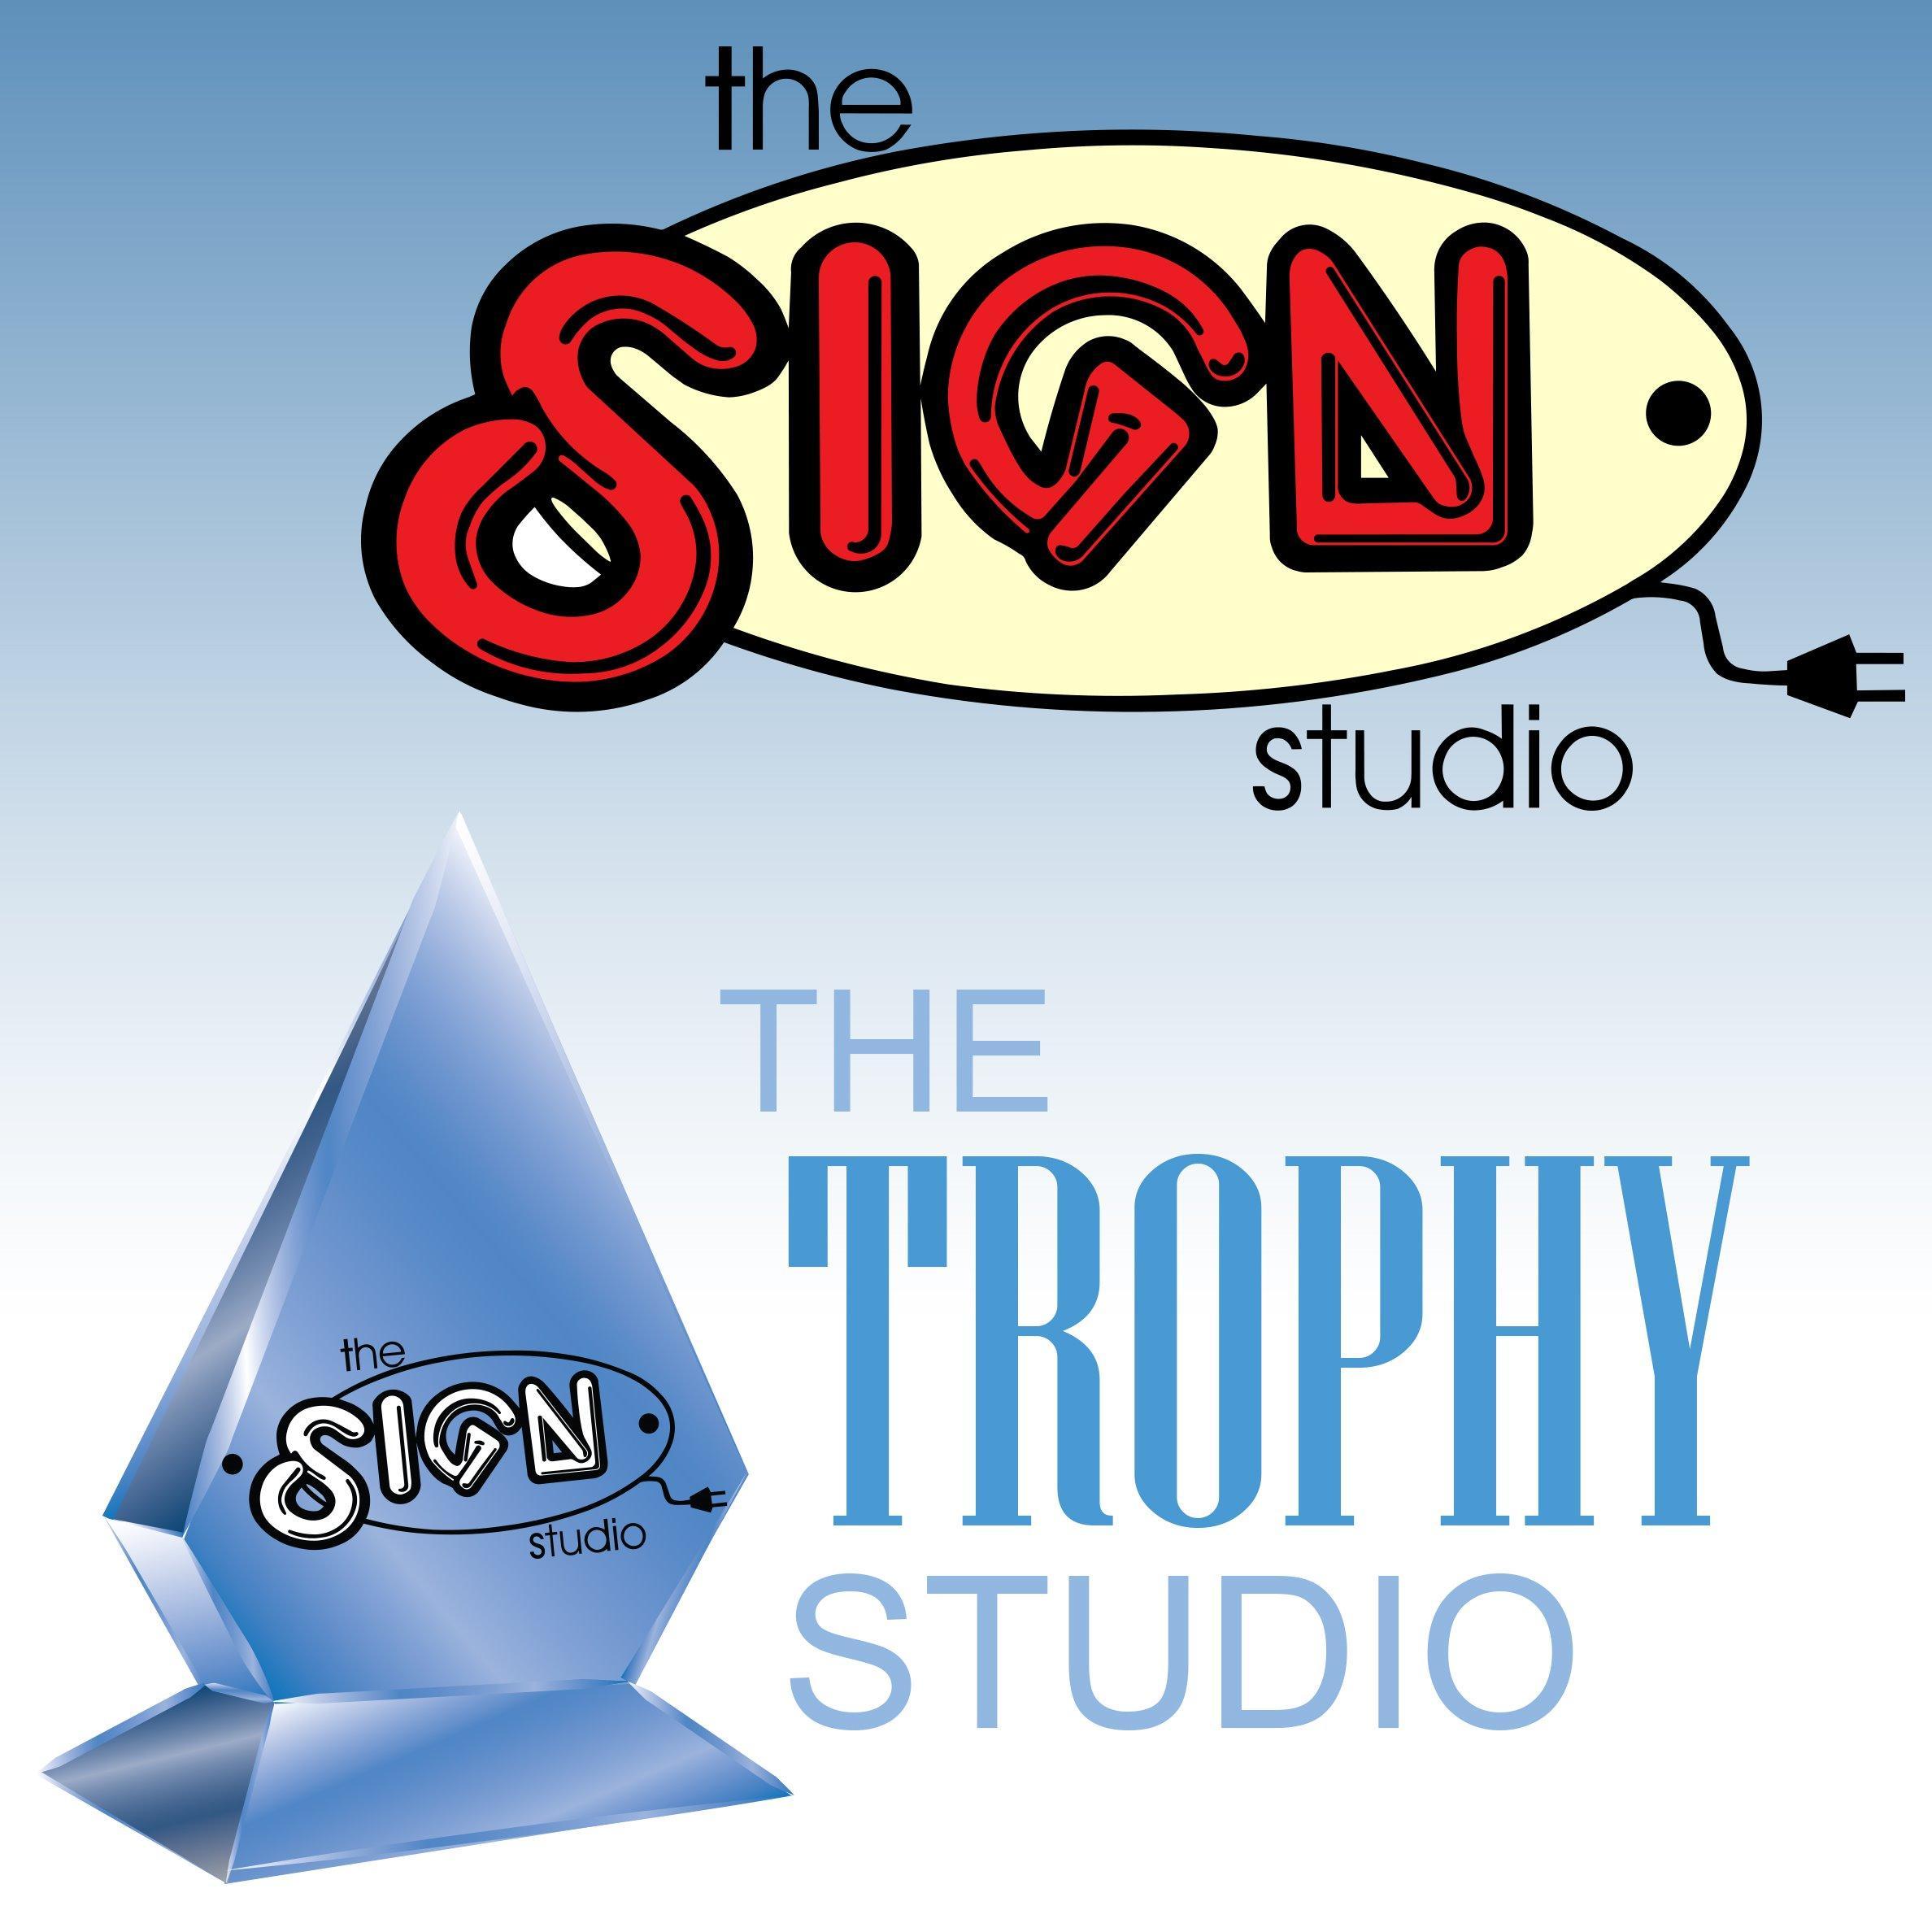 The Sign Studio/The Trophy Studio